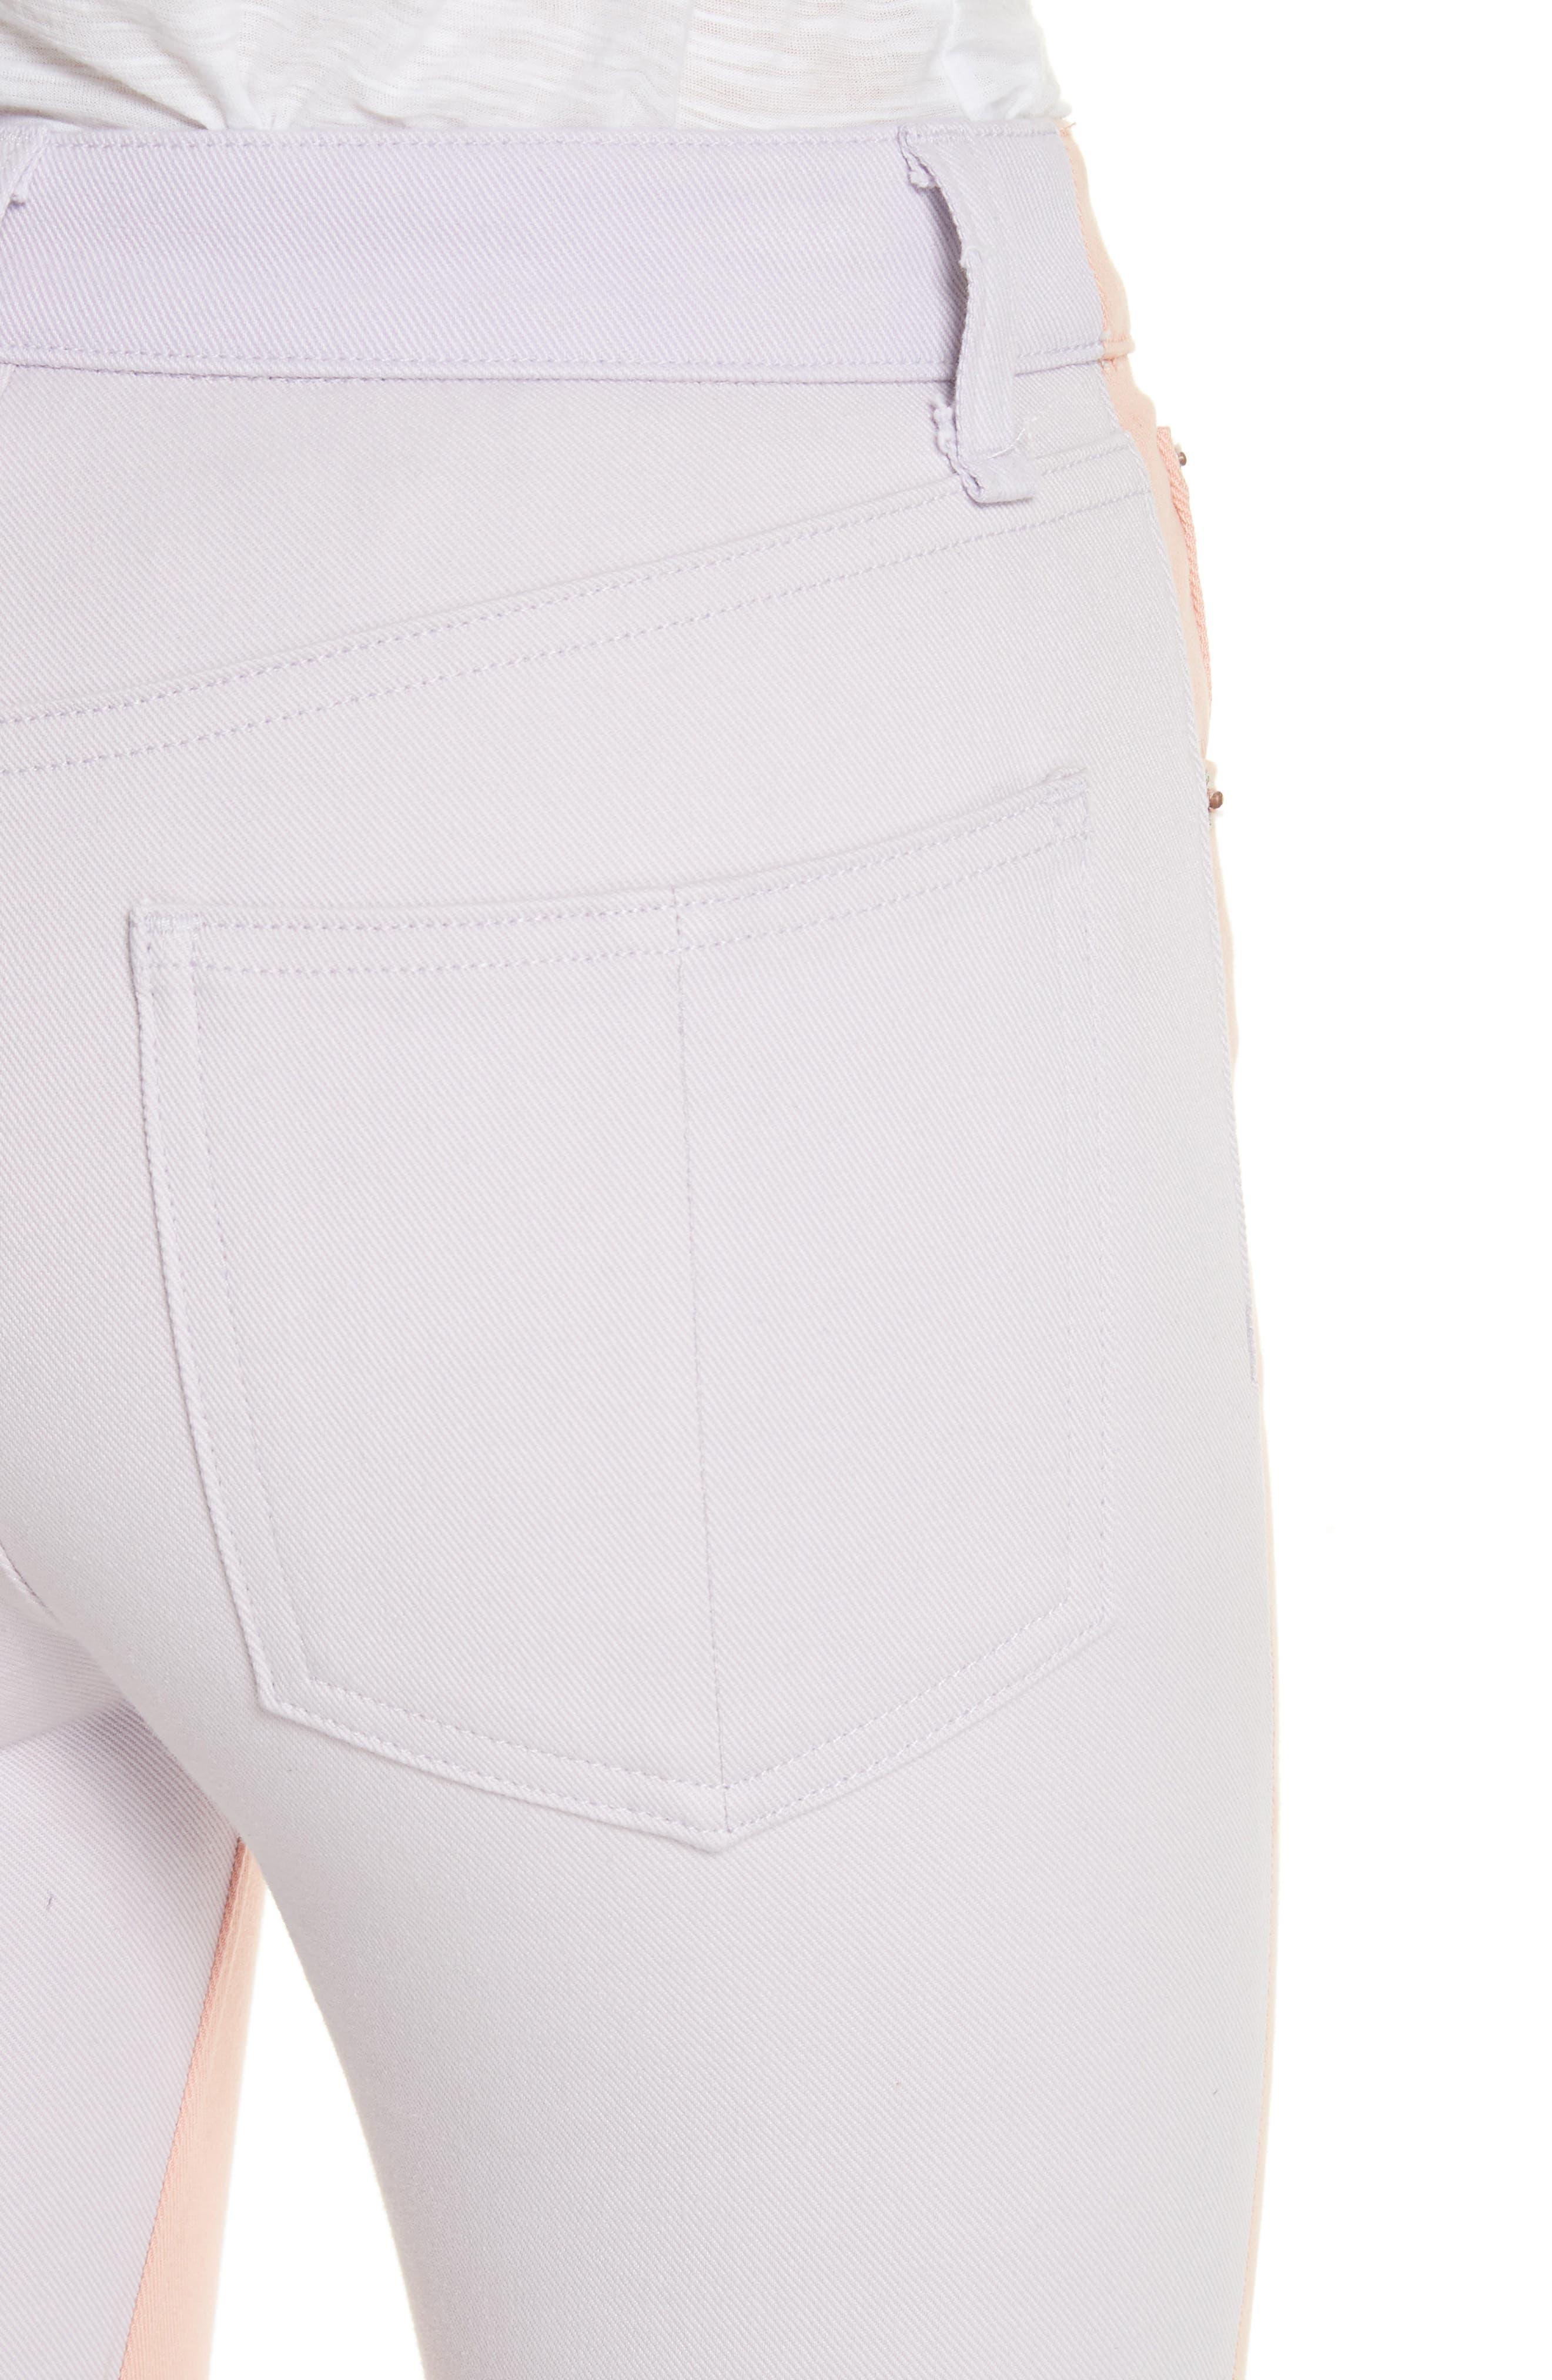 High Waist Skinny Jeans,                             Alternate thumbnail 4, color,                             Peach/ Lilac